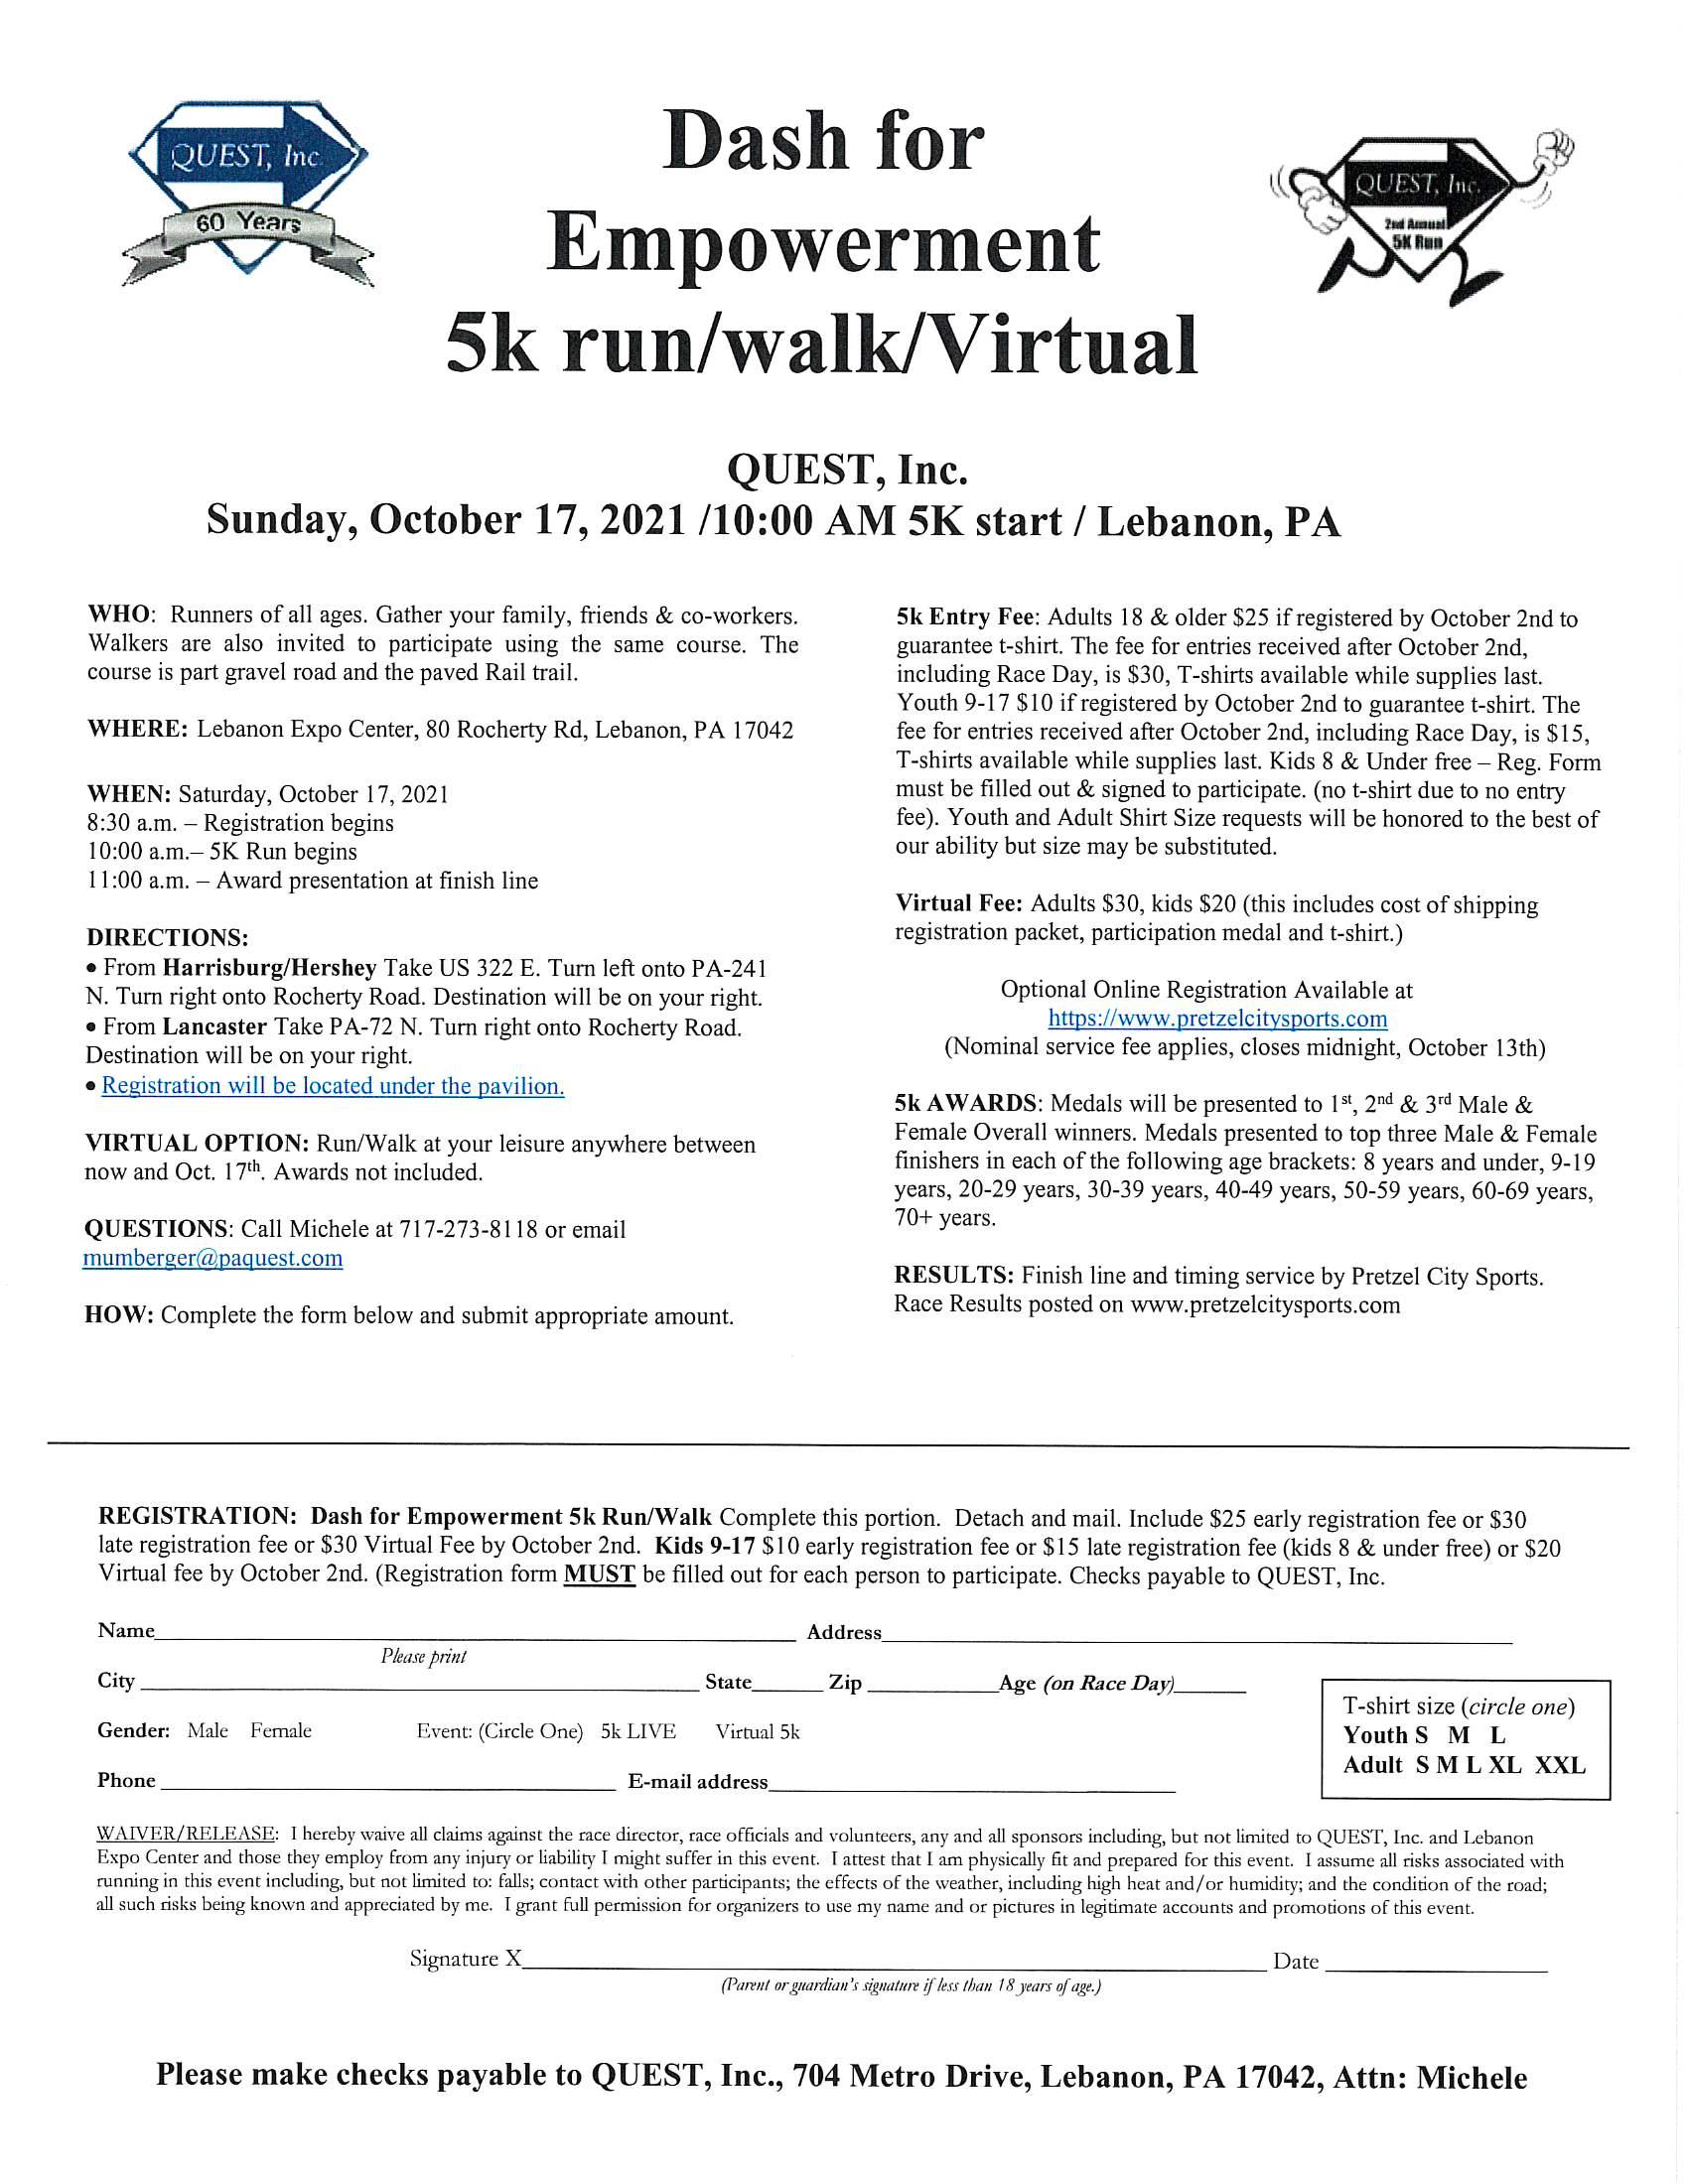 registration from